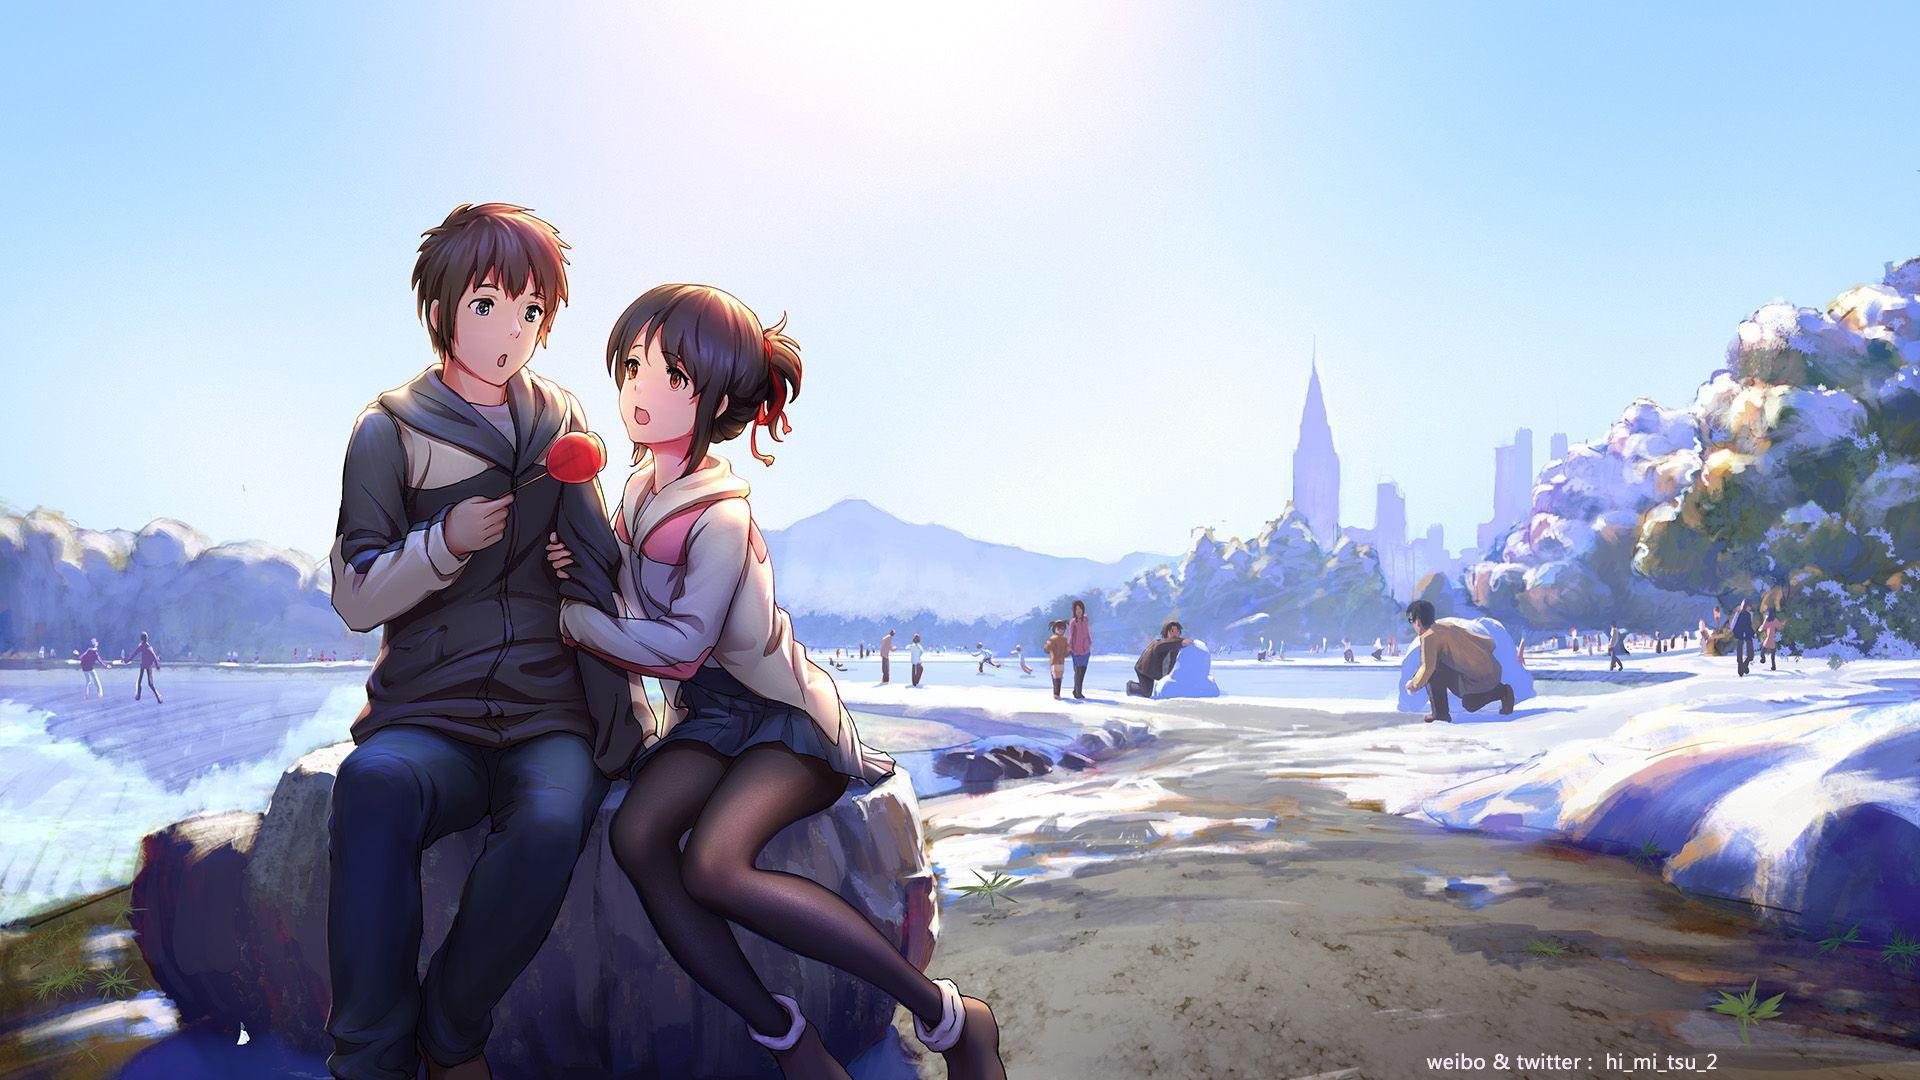 Unduh 43 Wallpaper Wa Anime Hd Gratis Terbaru